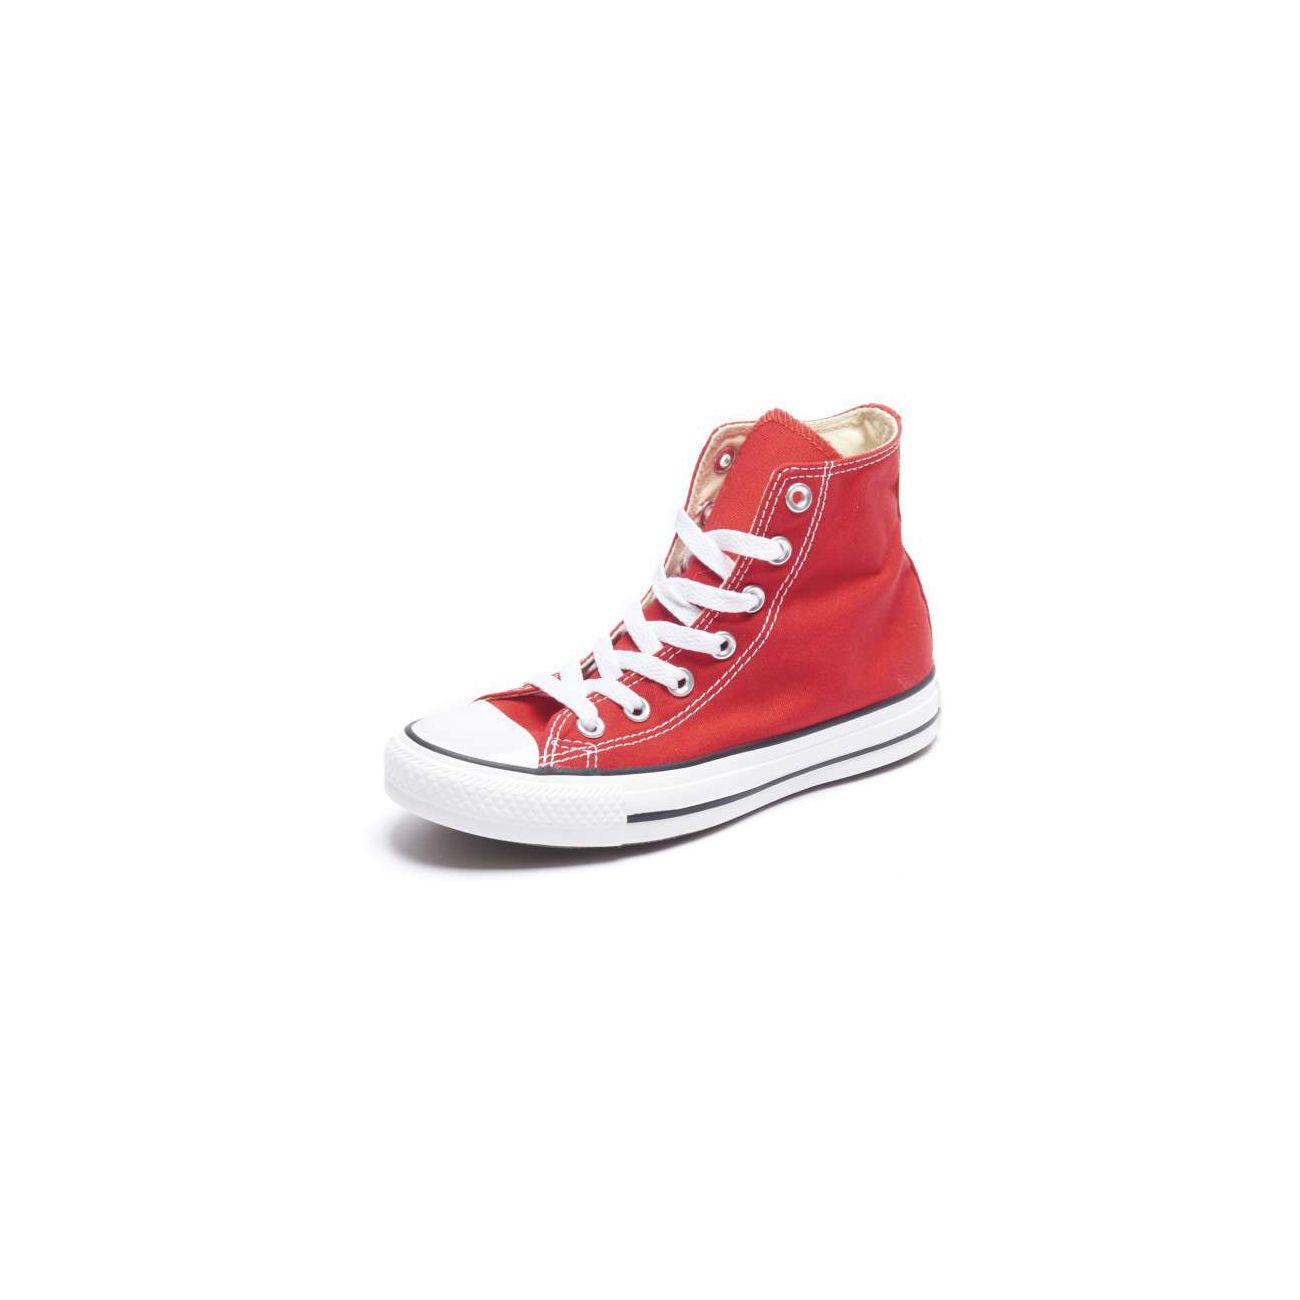 CONVERSE ALL STAR HI CANVAS CONVERSE Uomo Red  Mascheroni Sportswear